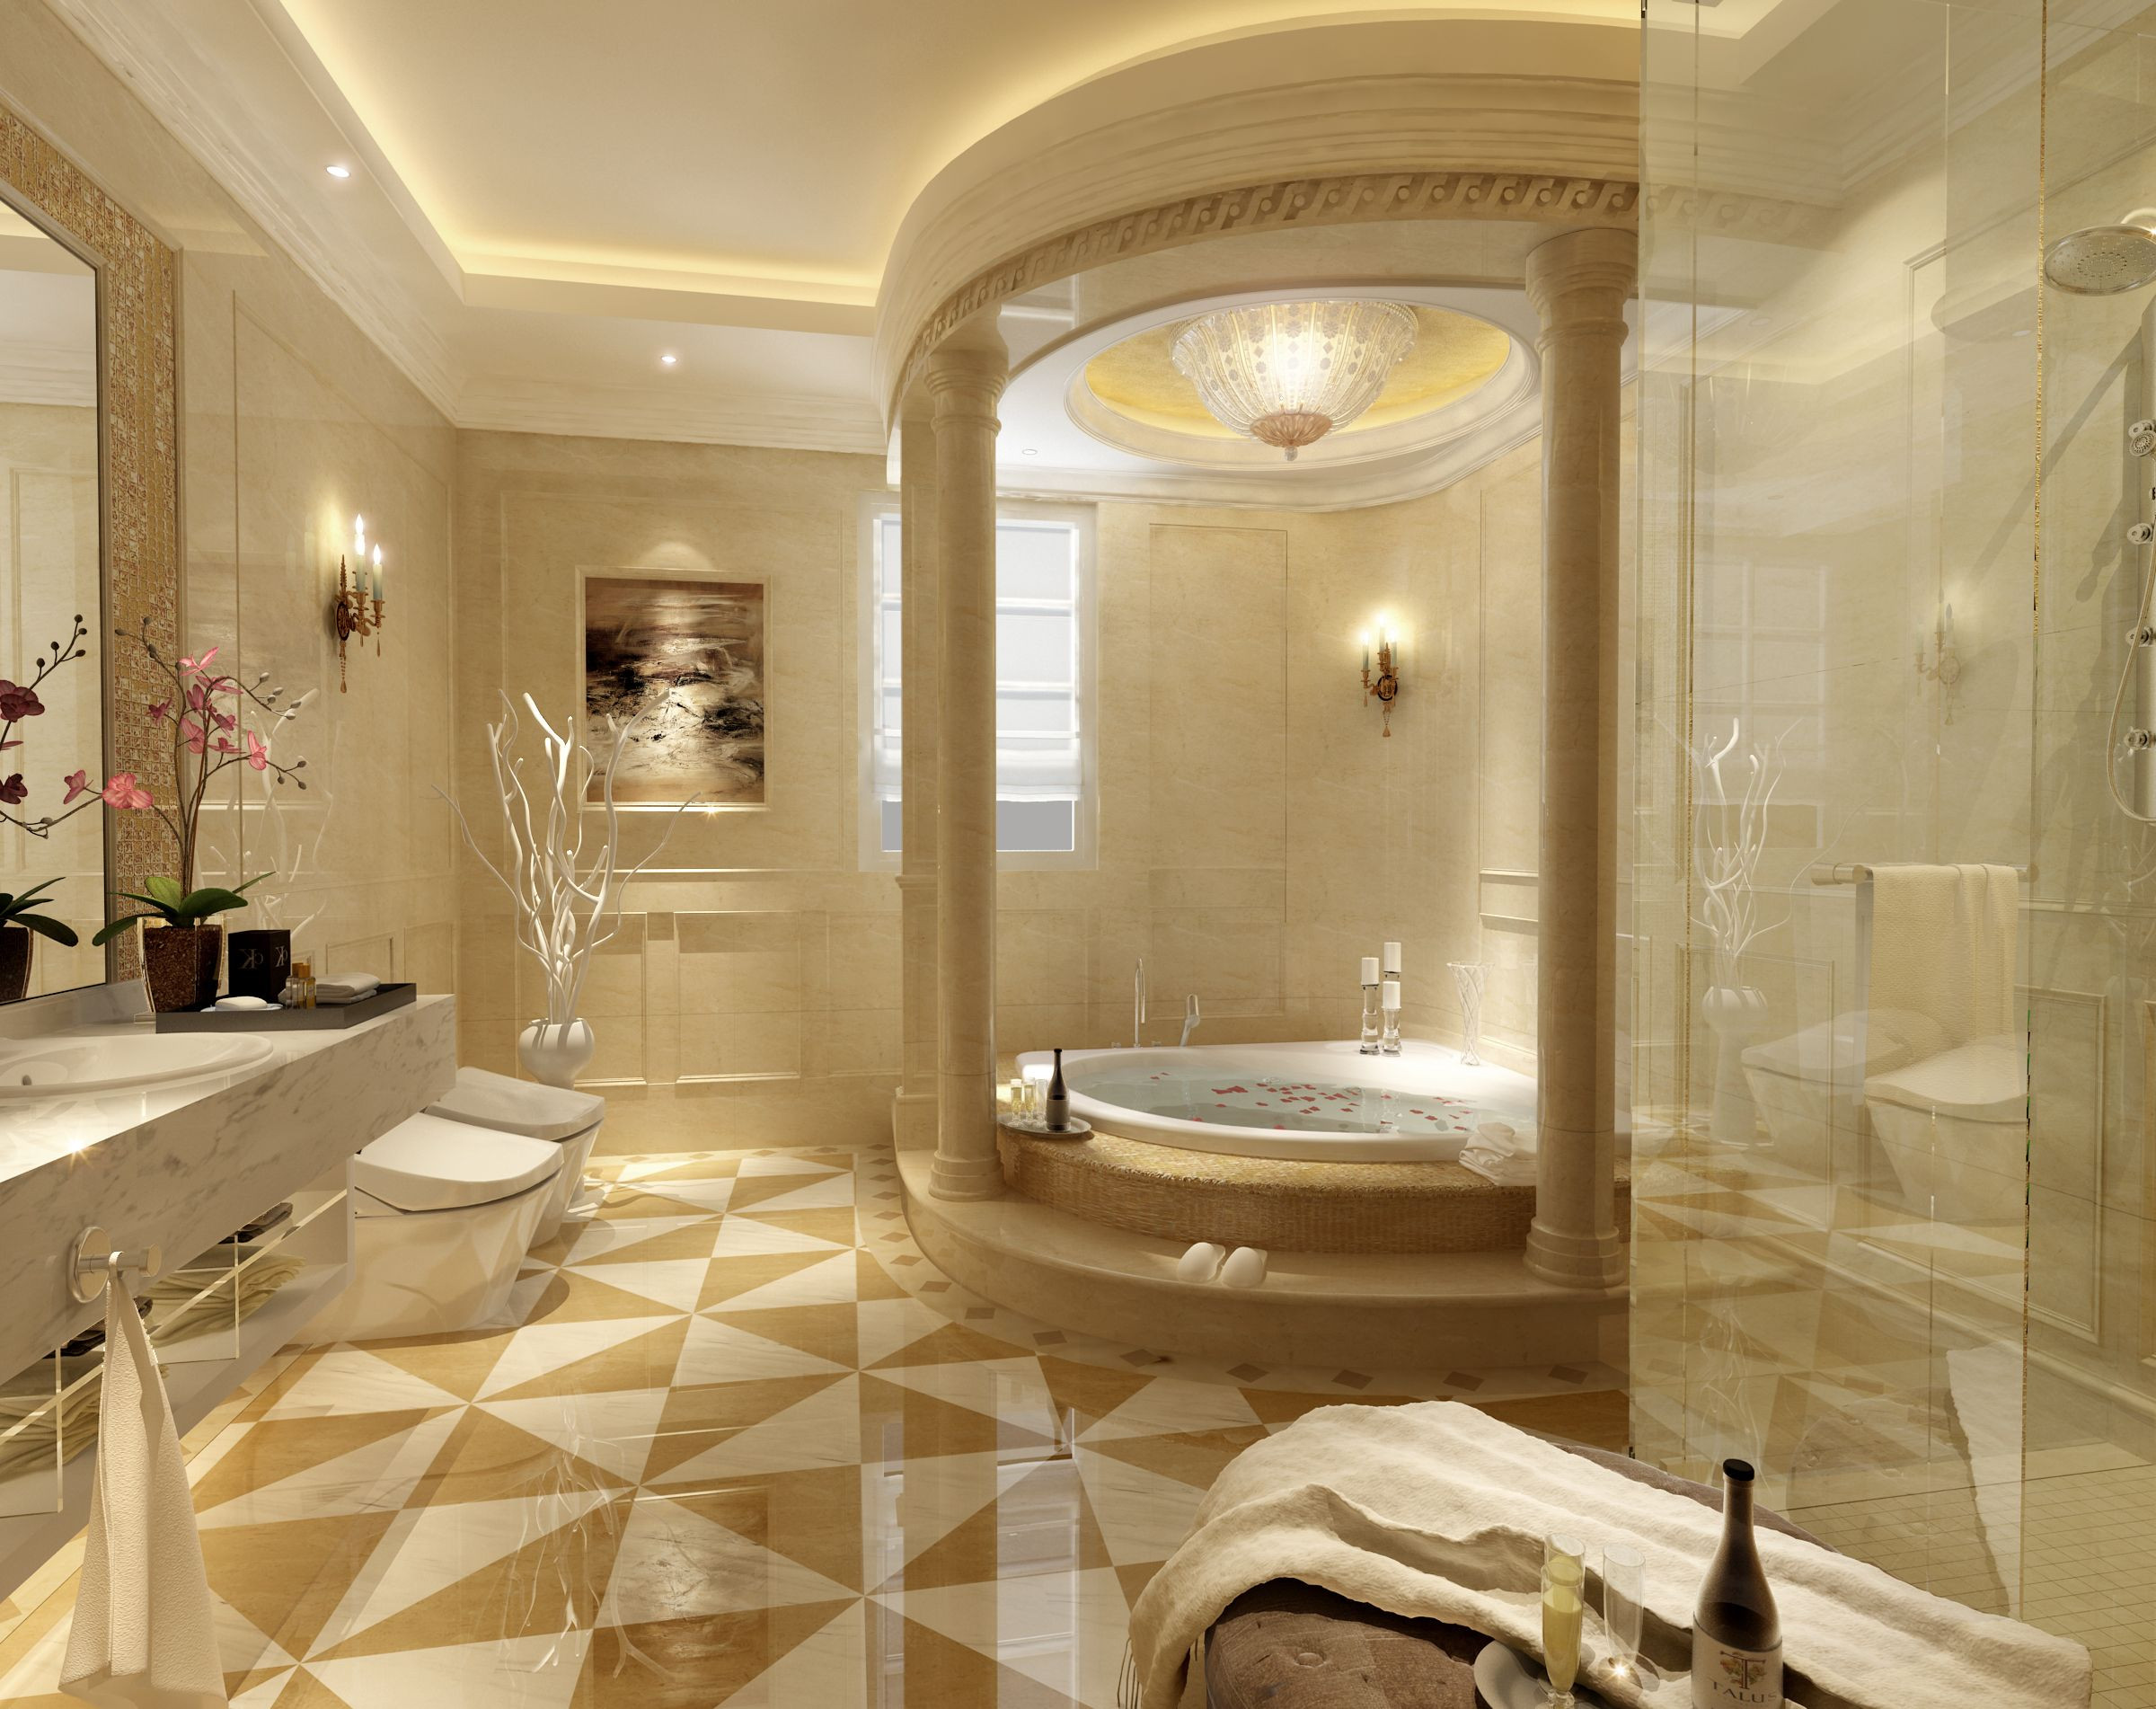 Breathtaking Bathrooms Design 55 Amazing Luxury Bathroom Designs